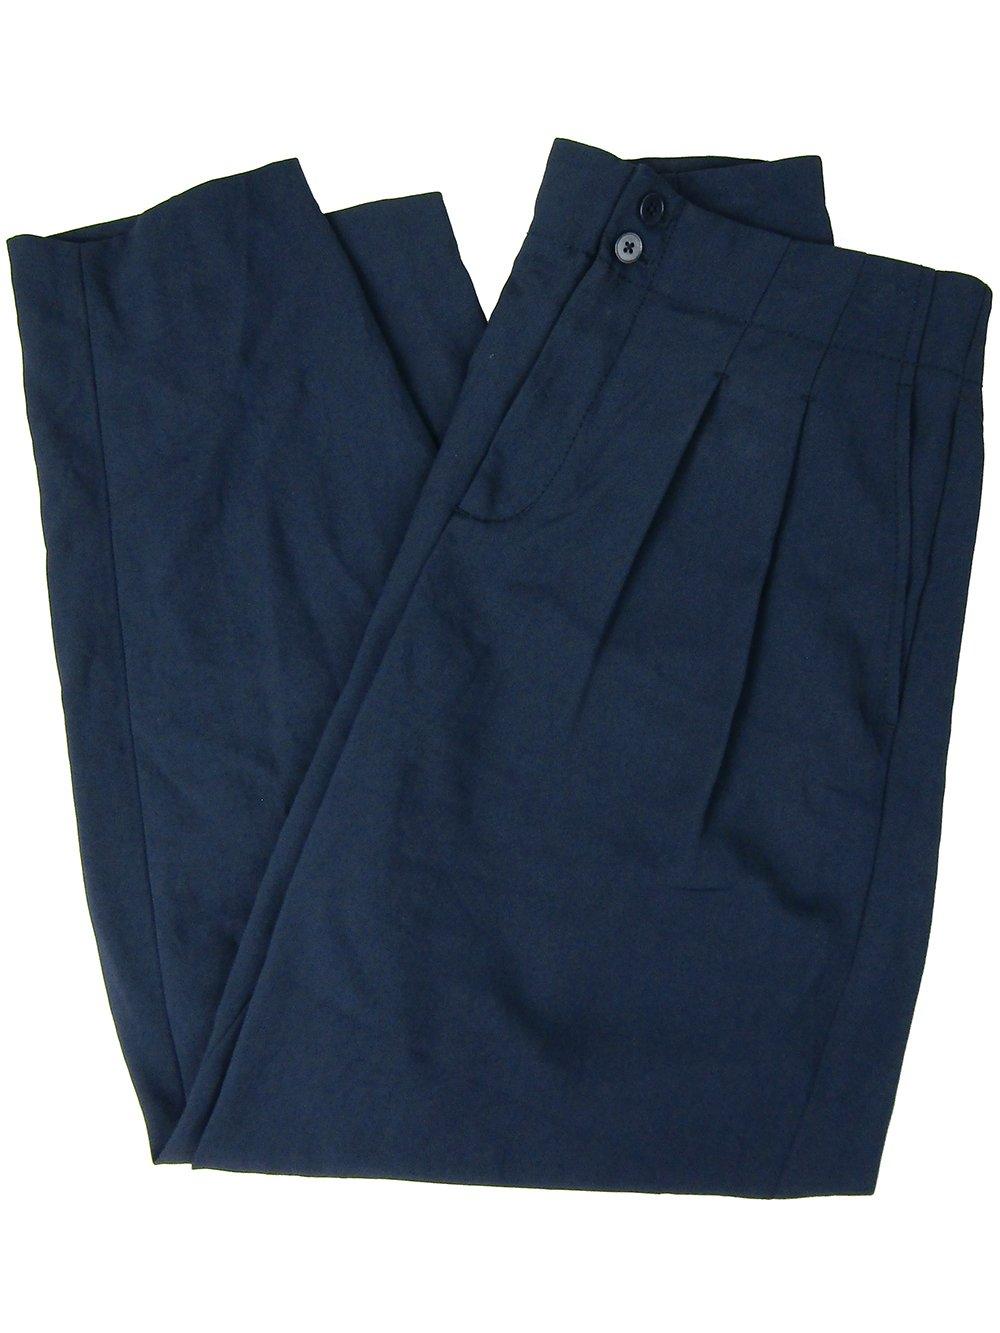 DKNY Women's Classic Fit Low Rise Ankle Pants (Dark Blue, 2)